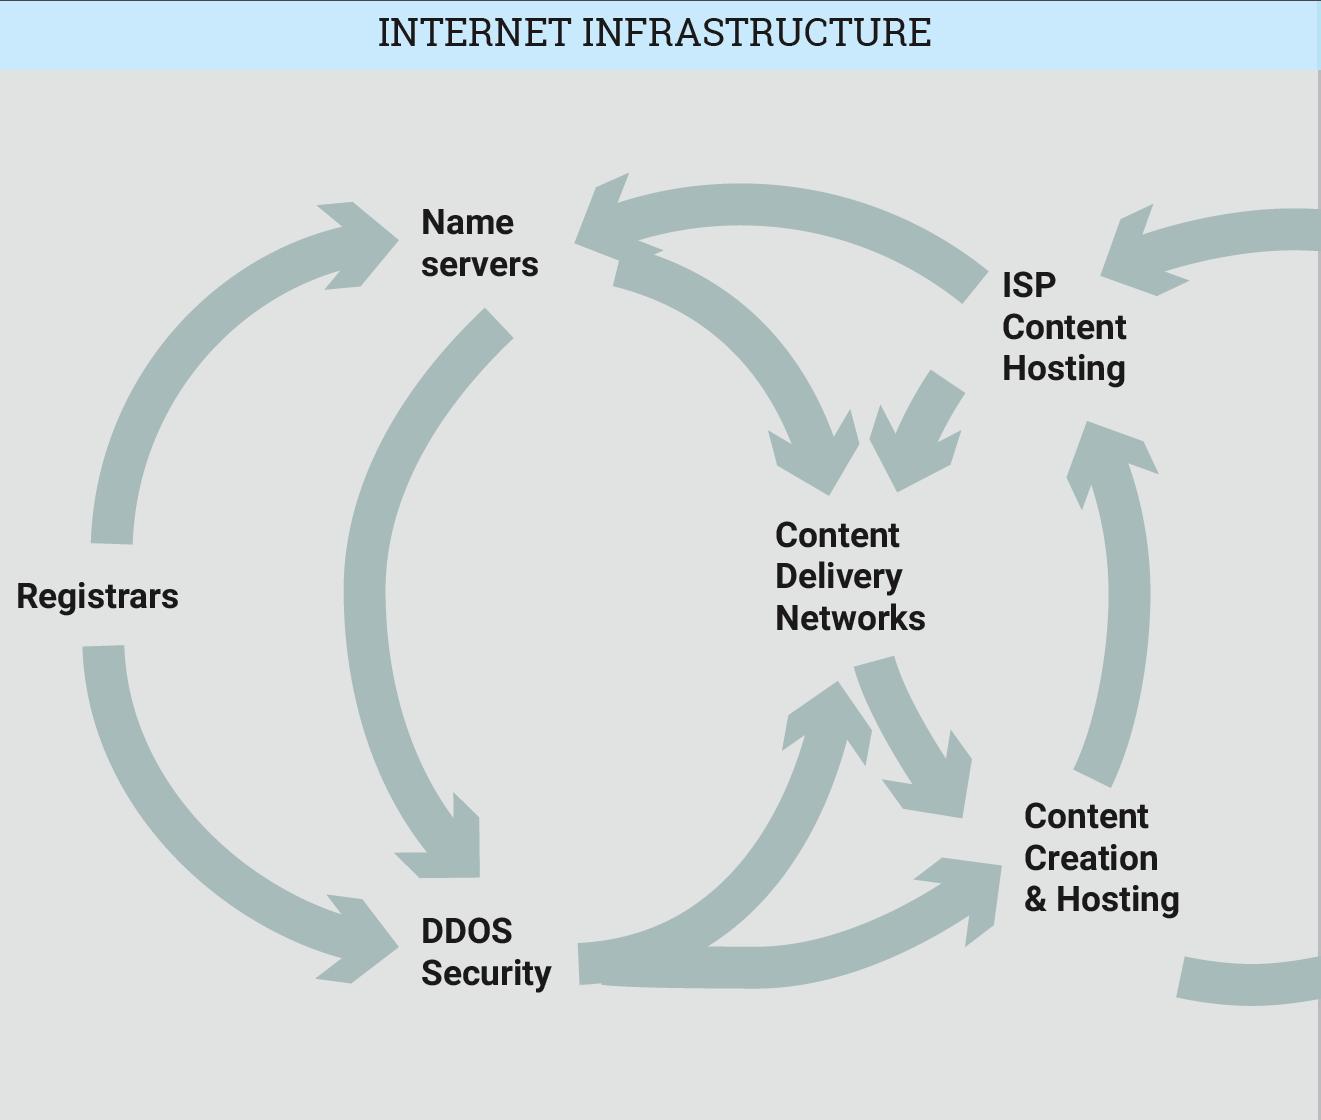 Internet Infrastructure circle